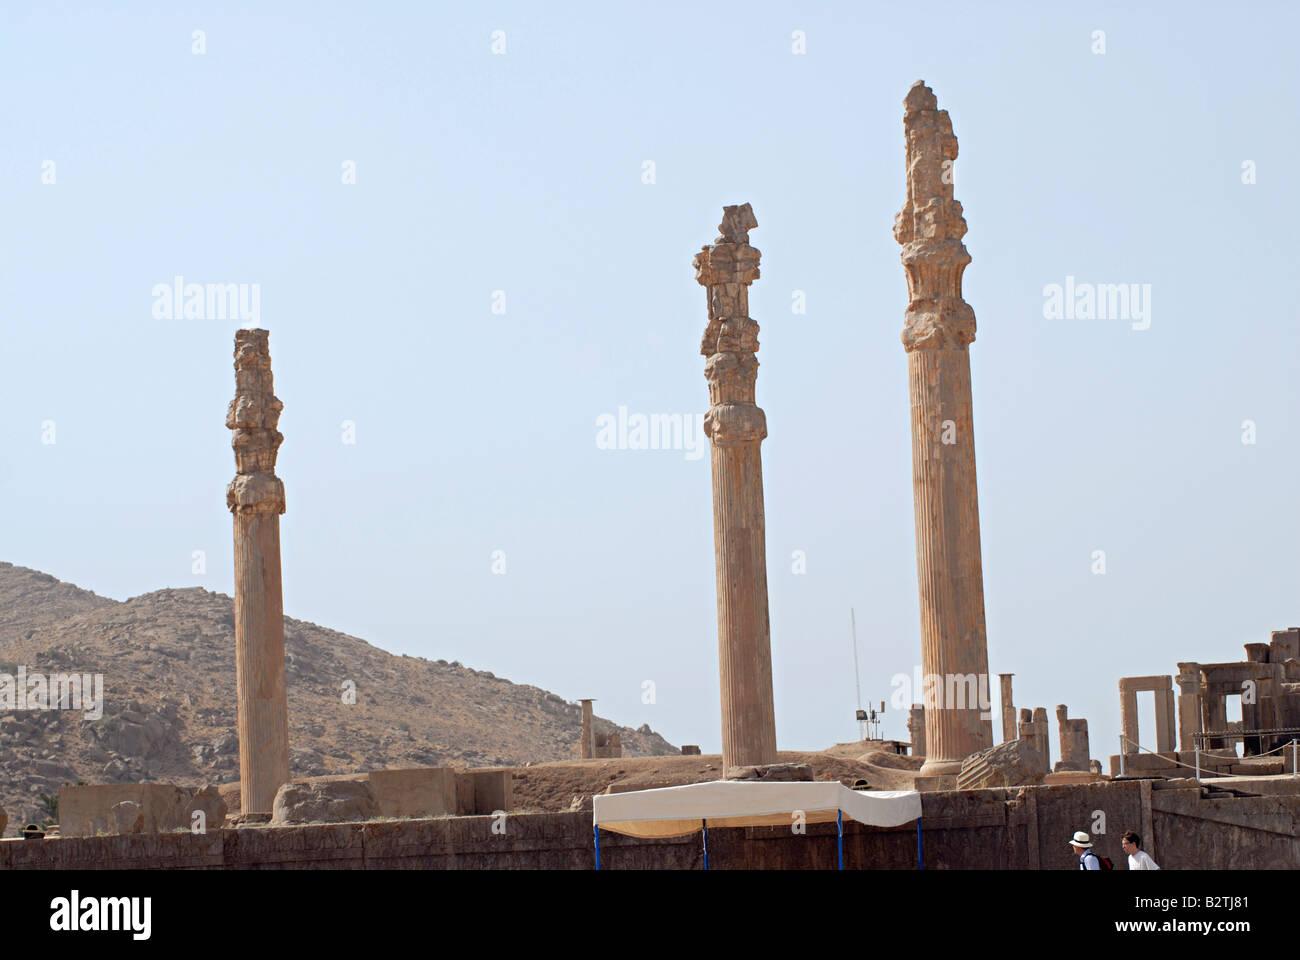 Iran Persepolis Remains Of Pillars Of The Apadana Palace Stock Photo Alamy